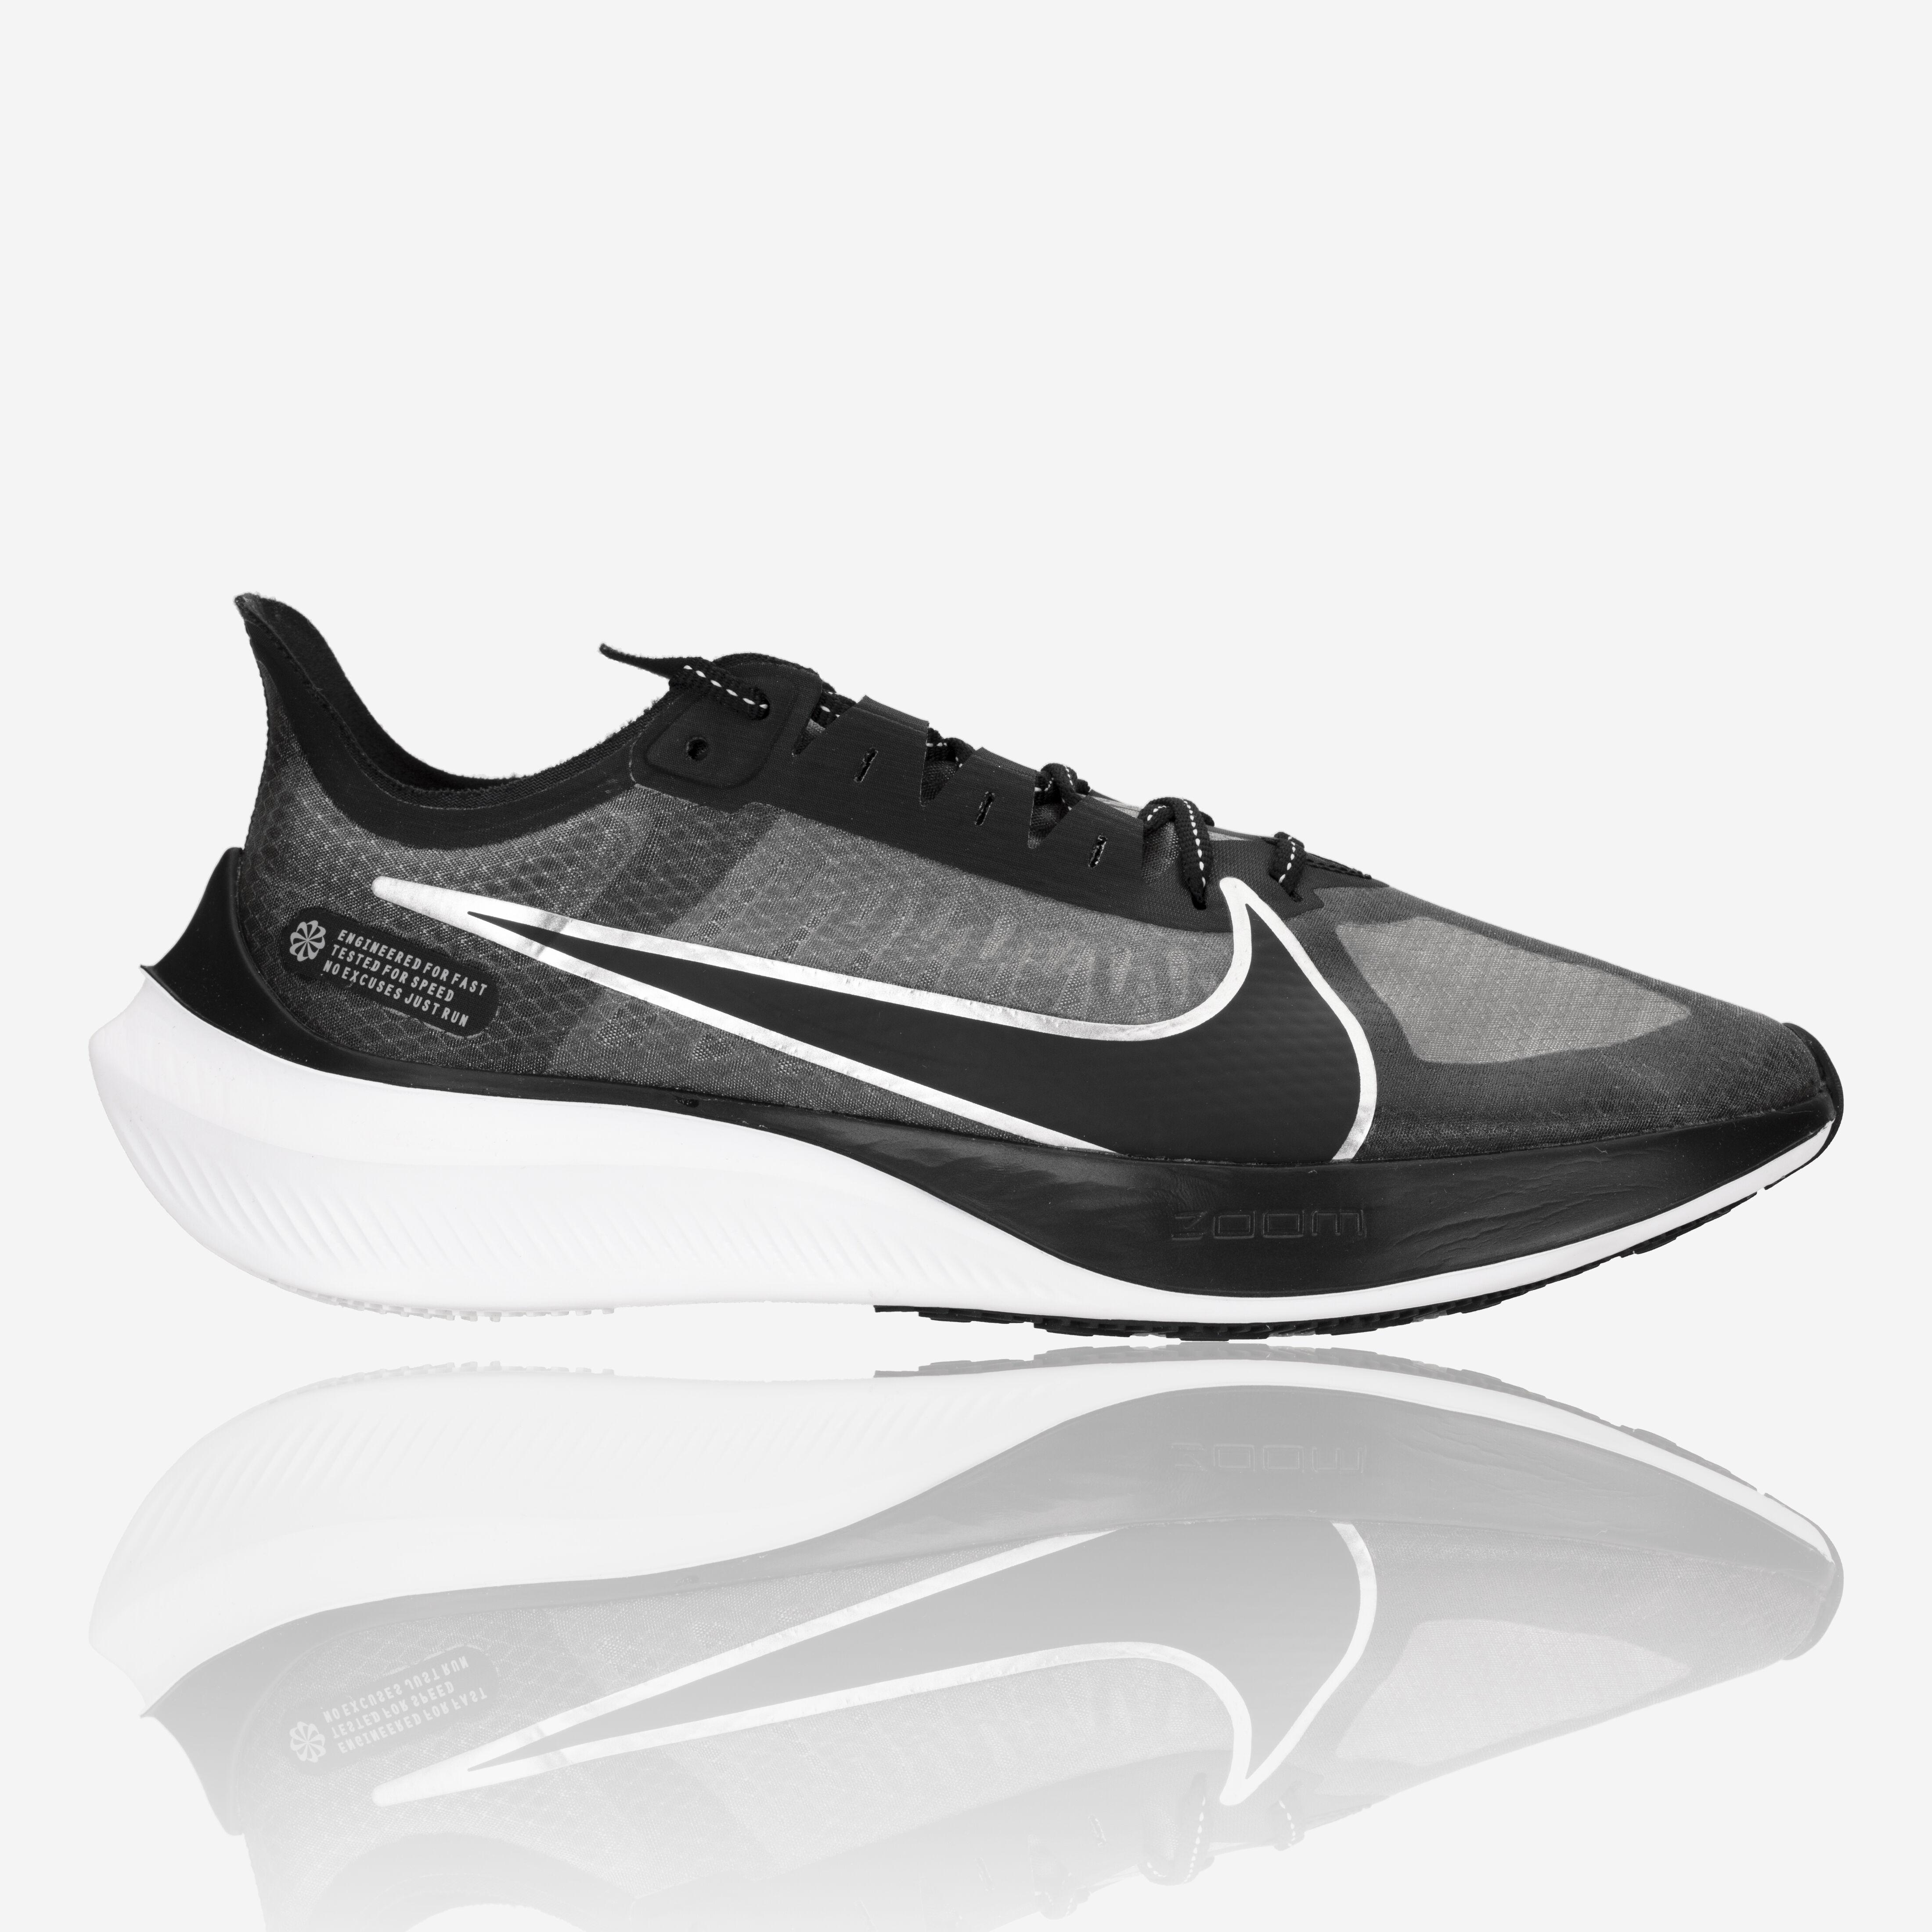 New Trainers & Gear. Nike GB